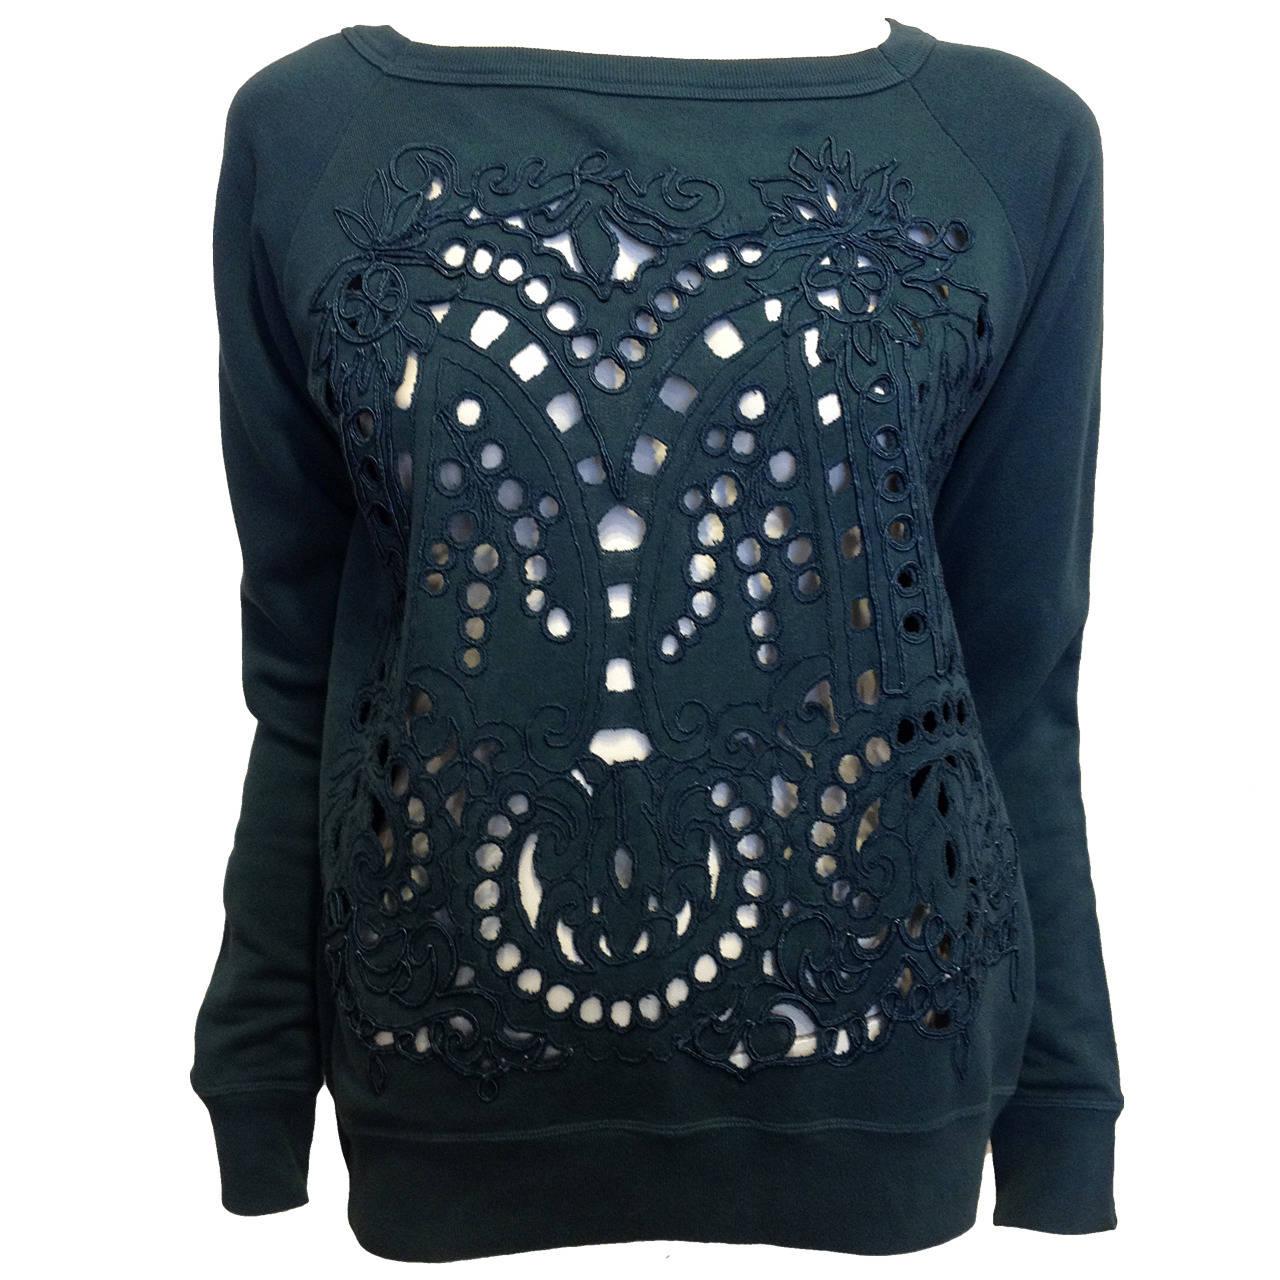 Dries Van Noten Teal Green Cutout Embroidered Sweatshirt 1